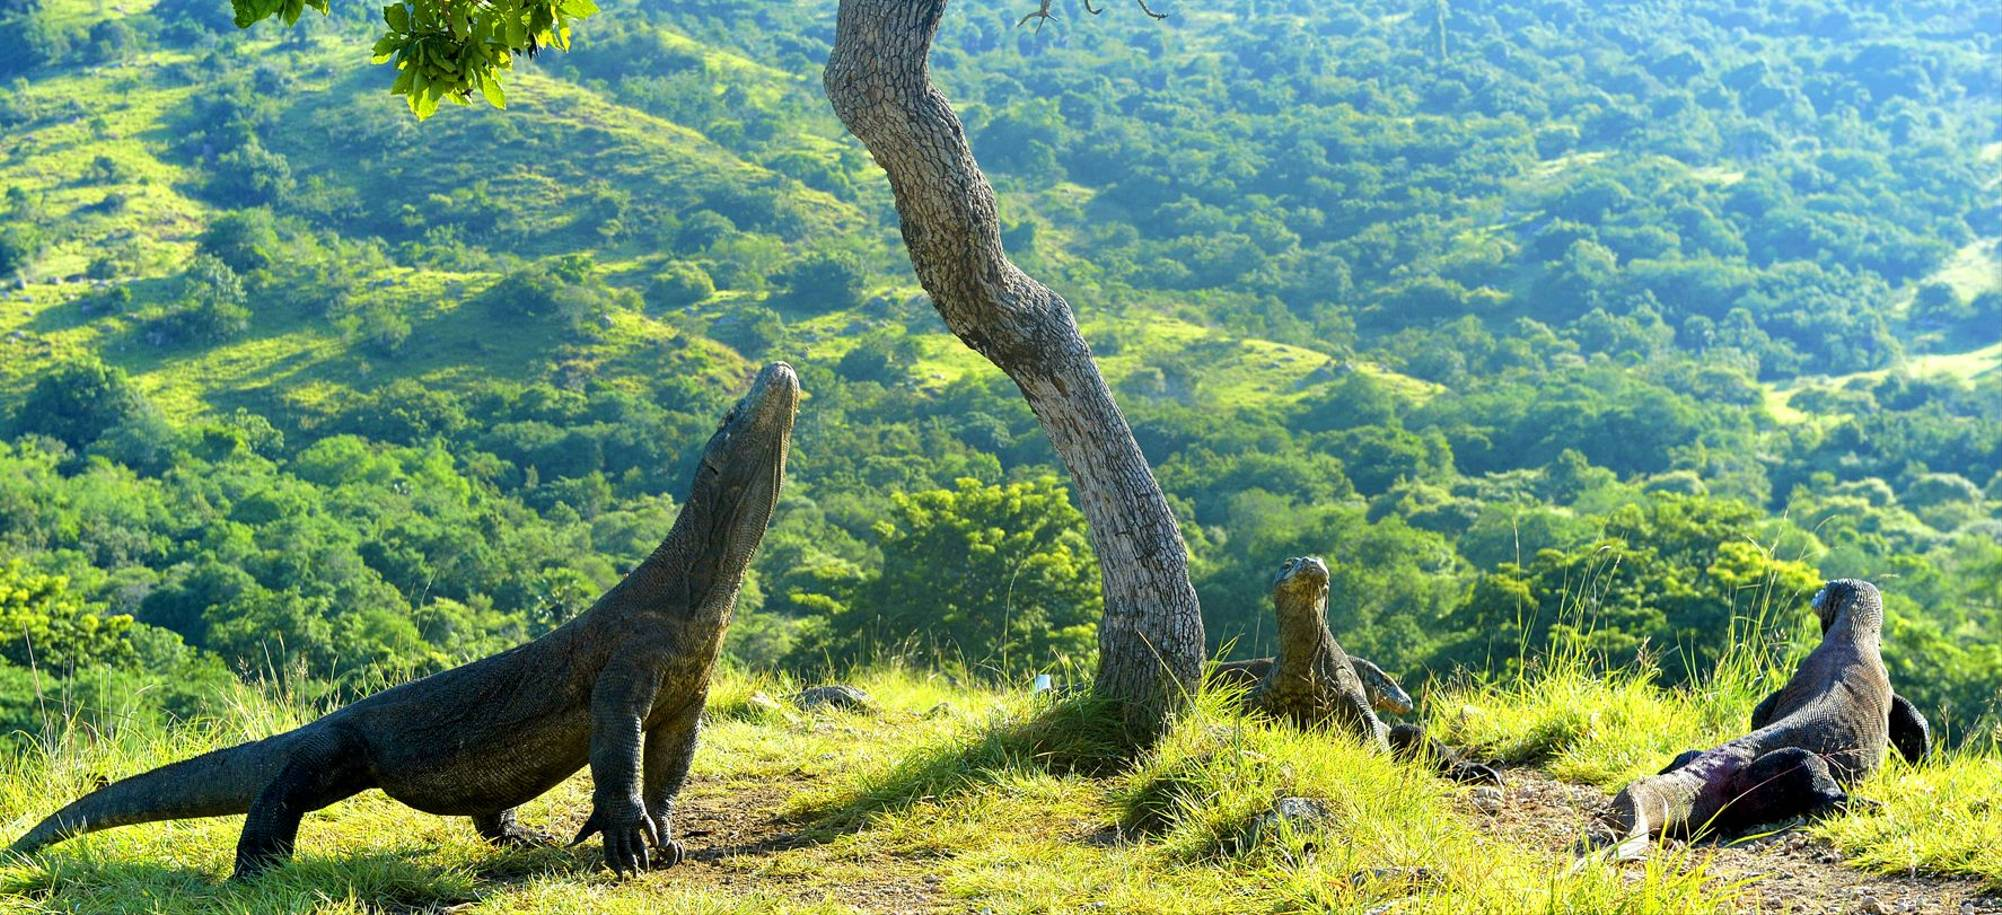 Komodo Island   Komodo Dragons   Itinerary Desktop